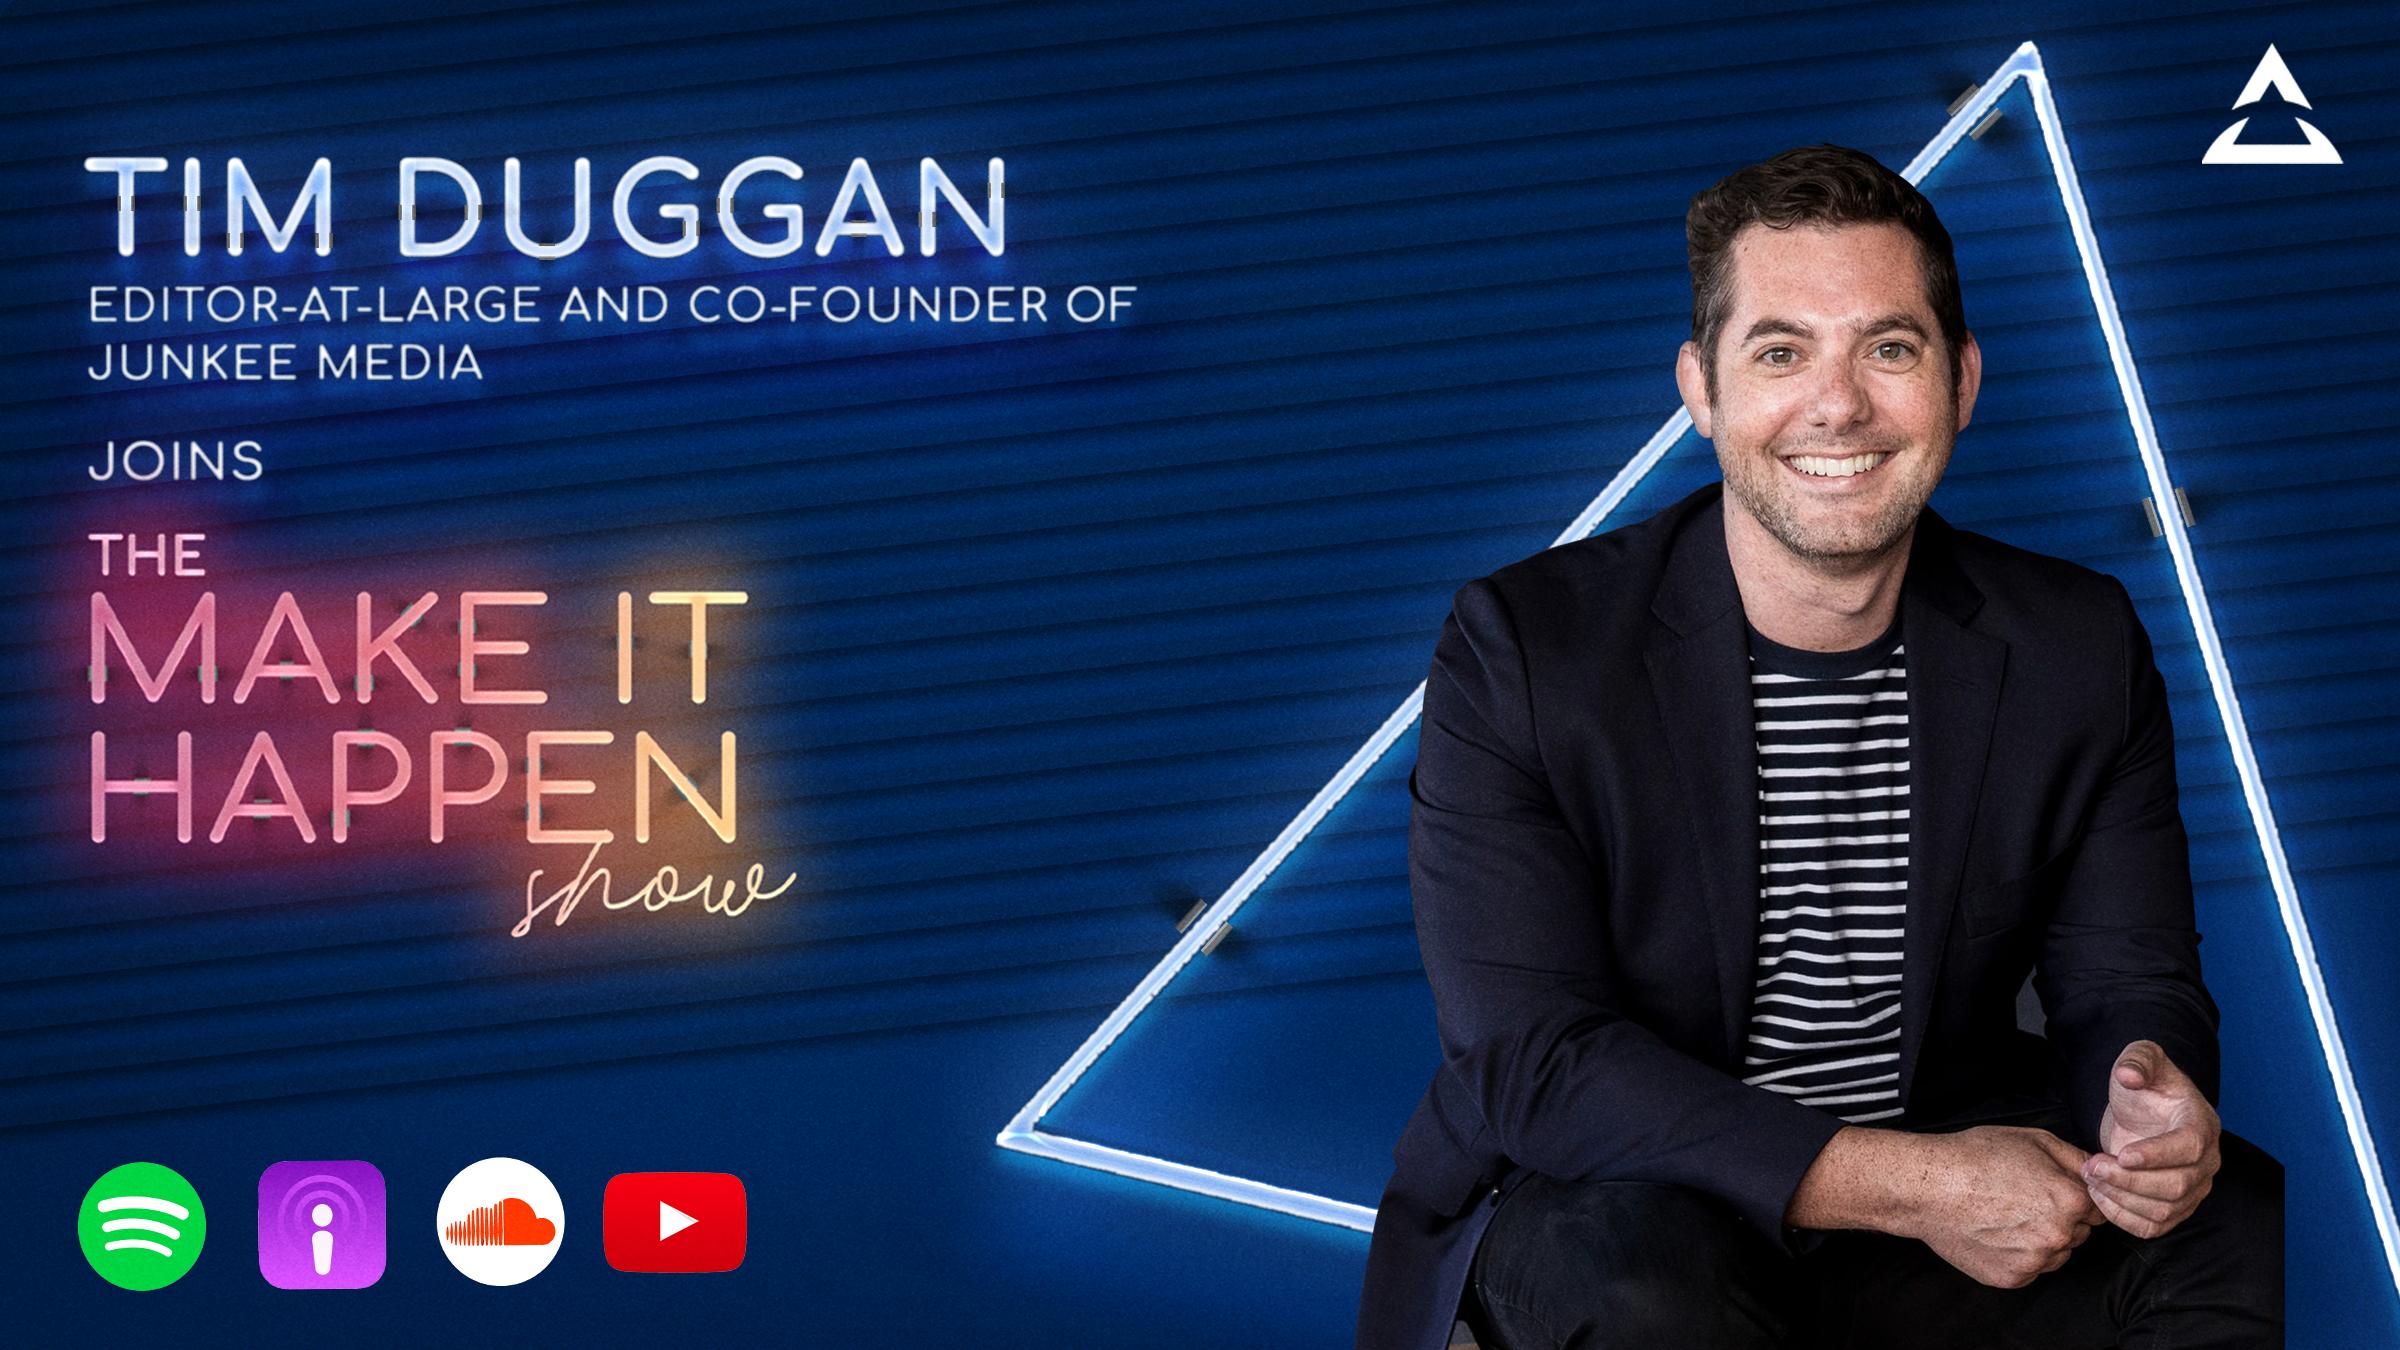 Tim Duggan on The Make It Happen Show podcast